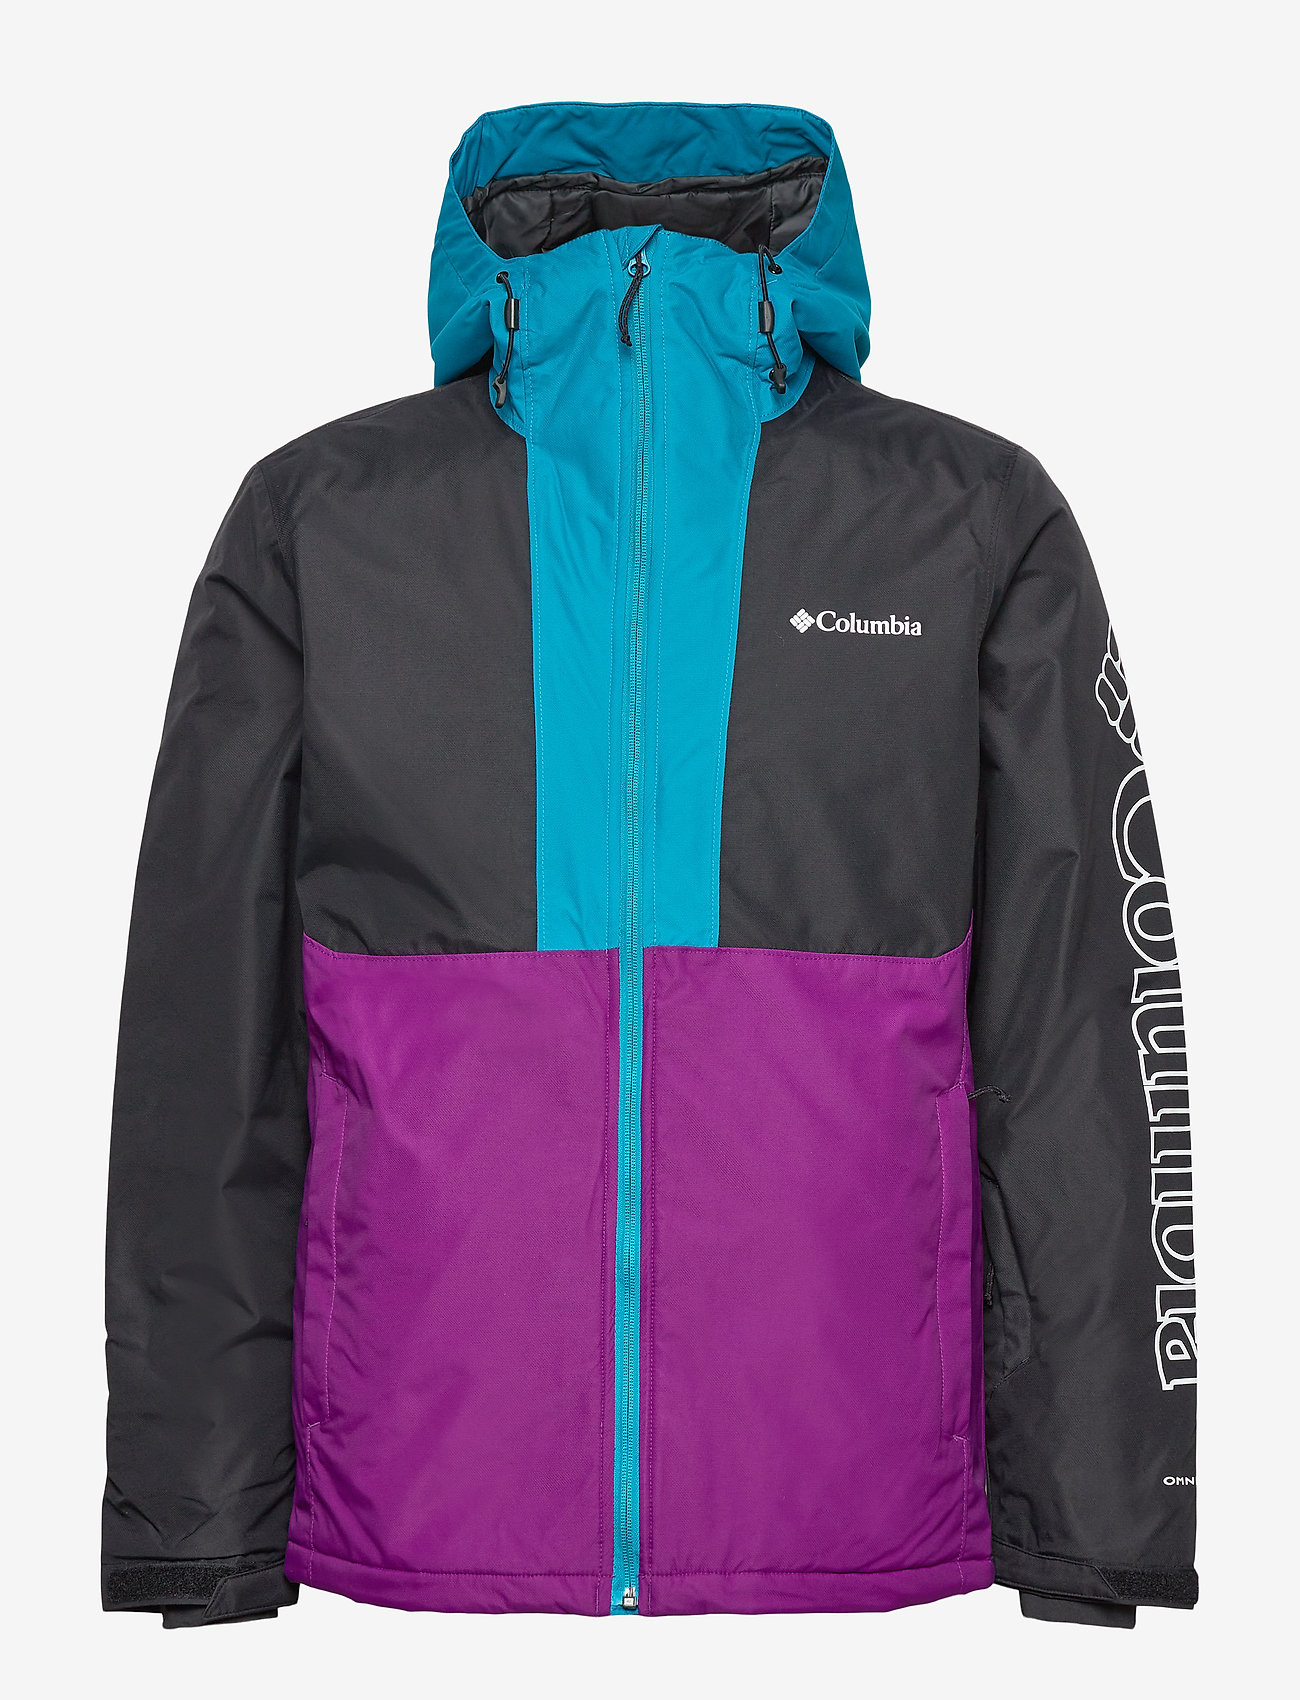 Columbia - Timberturner Jacket - kurtki narciarskie - plum, black, fj - 0